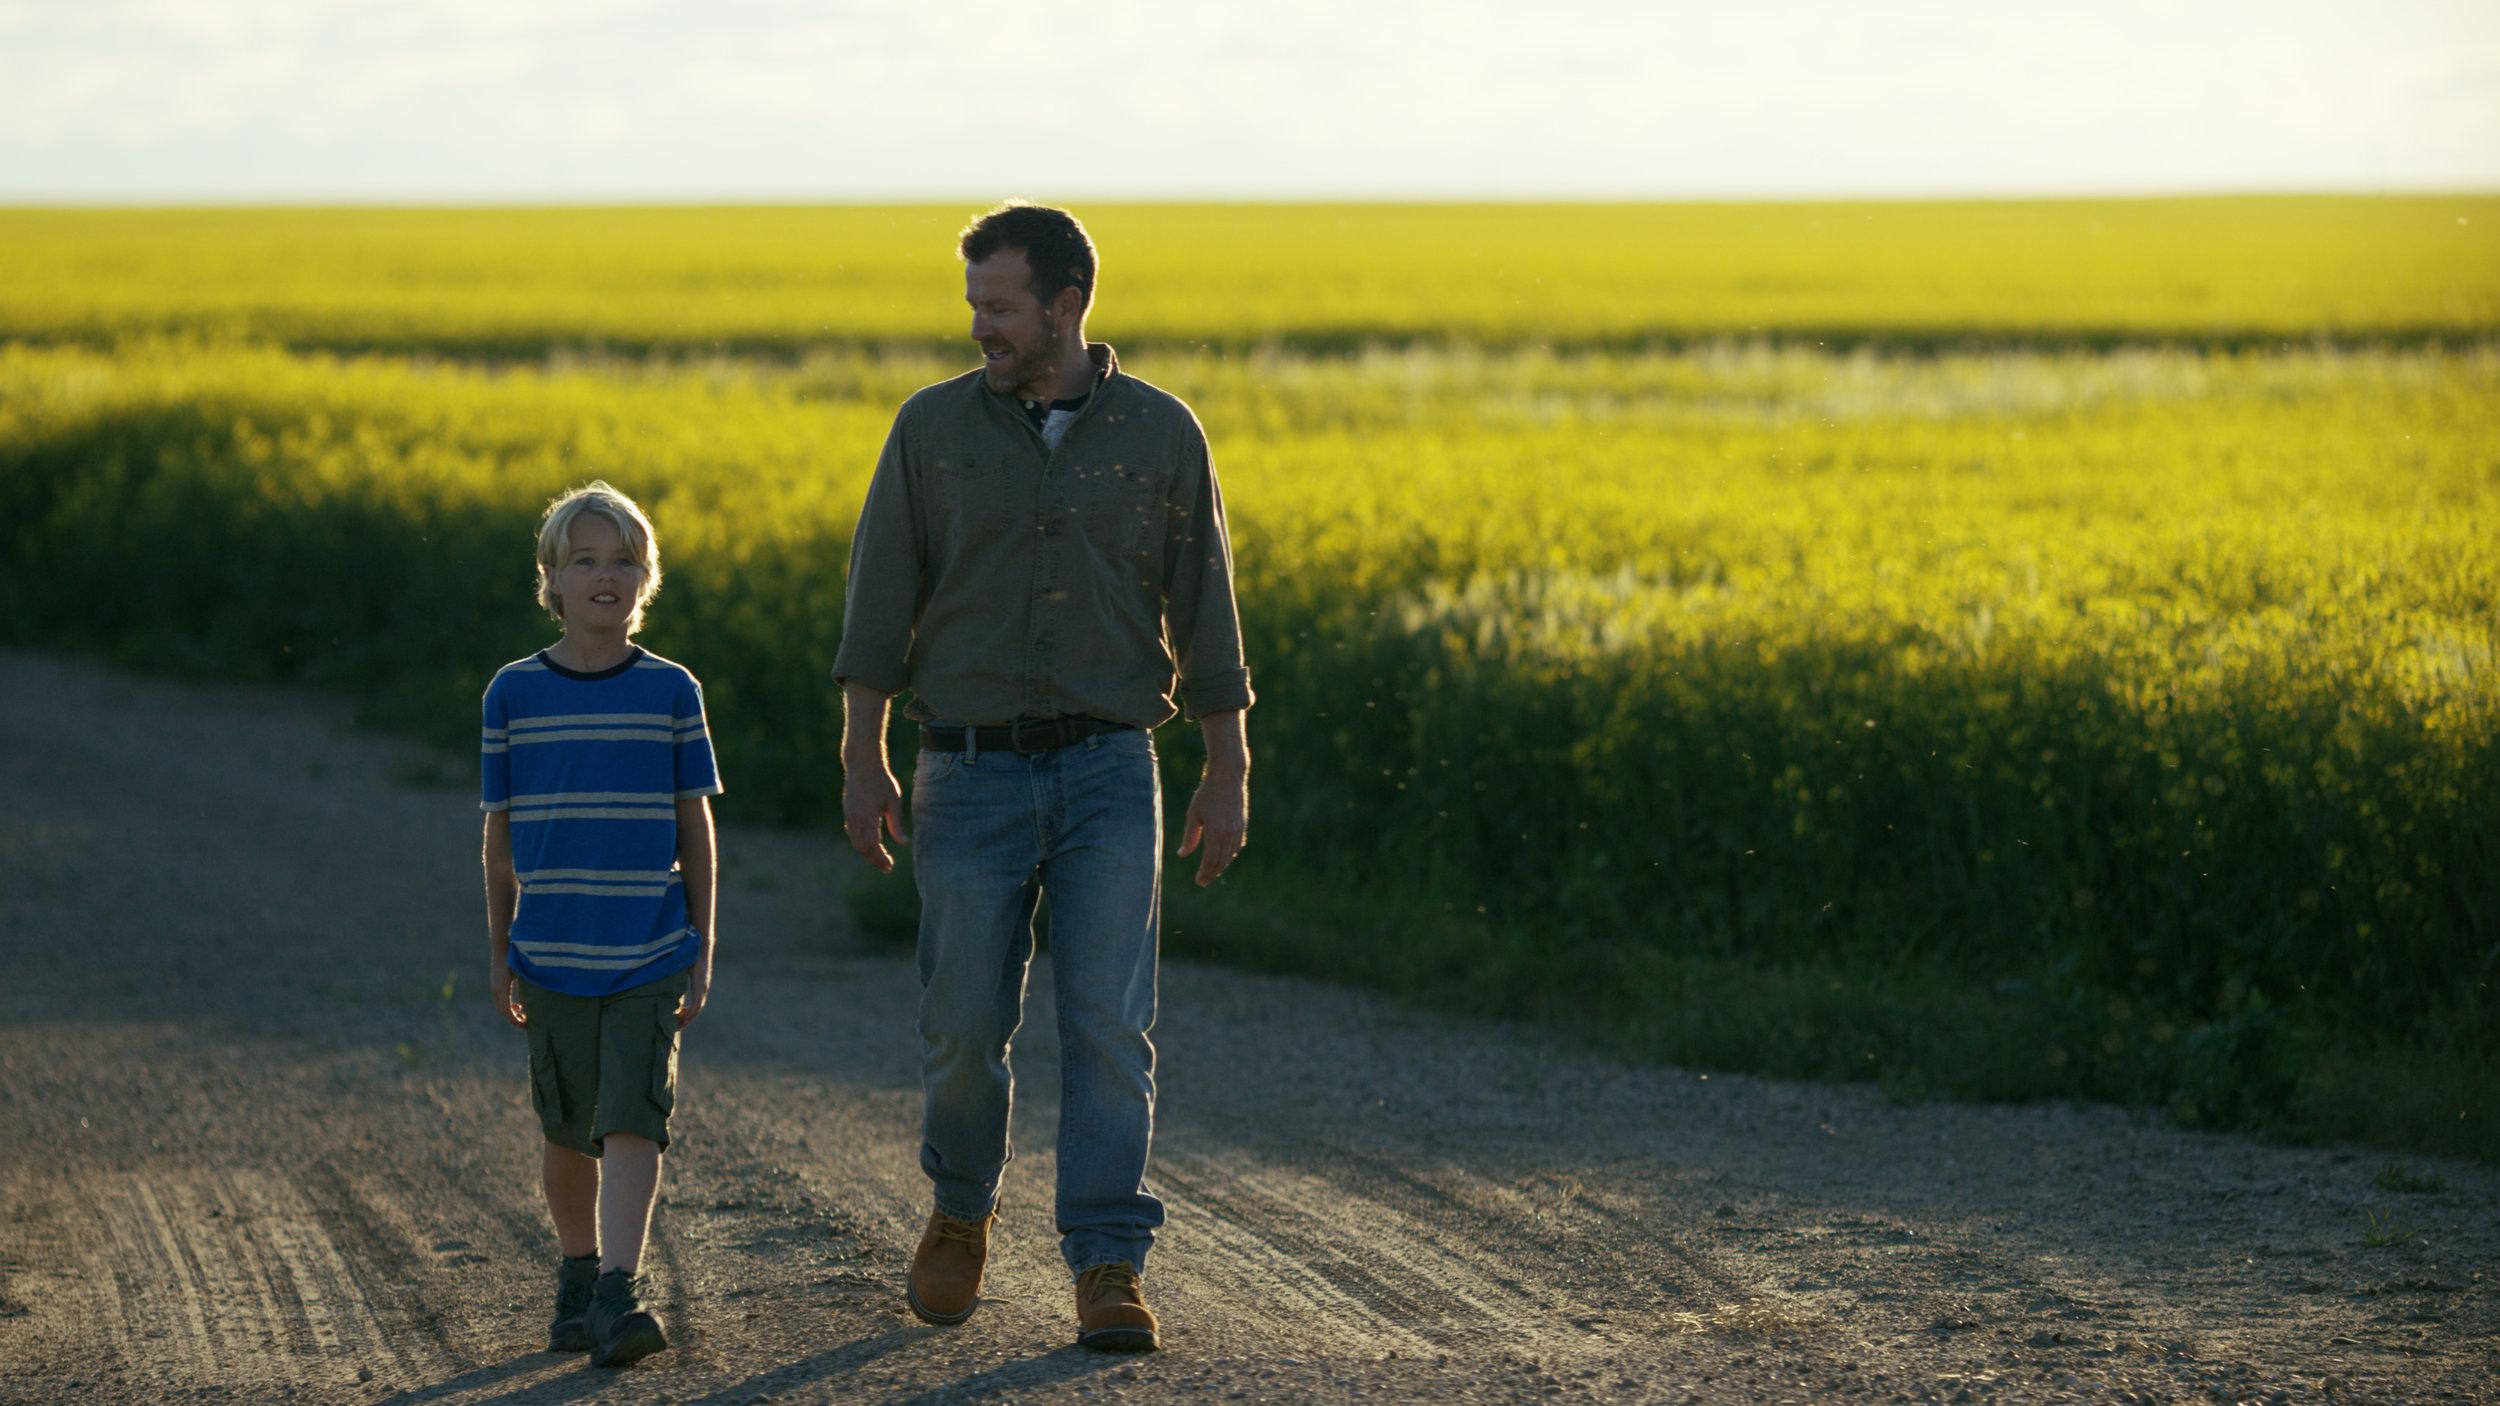 Selects - Farmer and Son.00_04_40_17.Still022.jpg